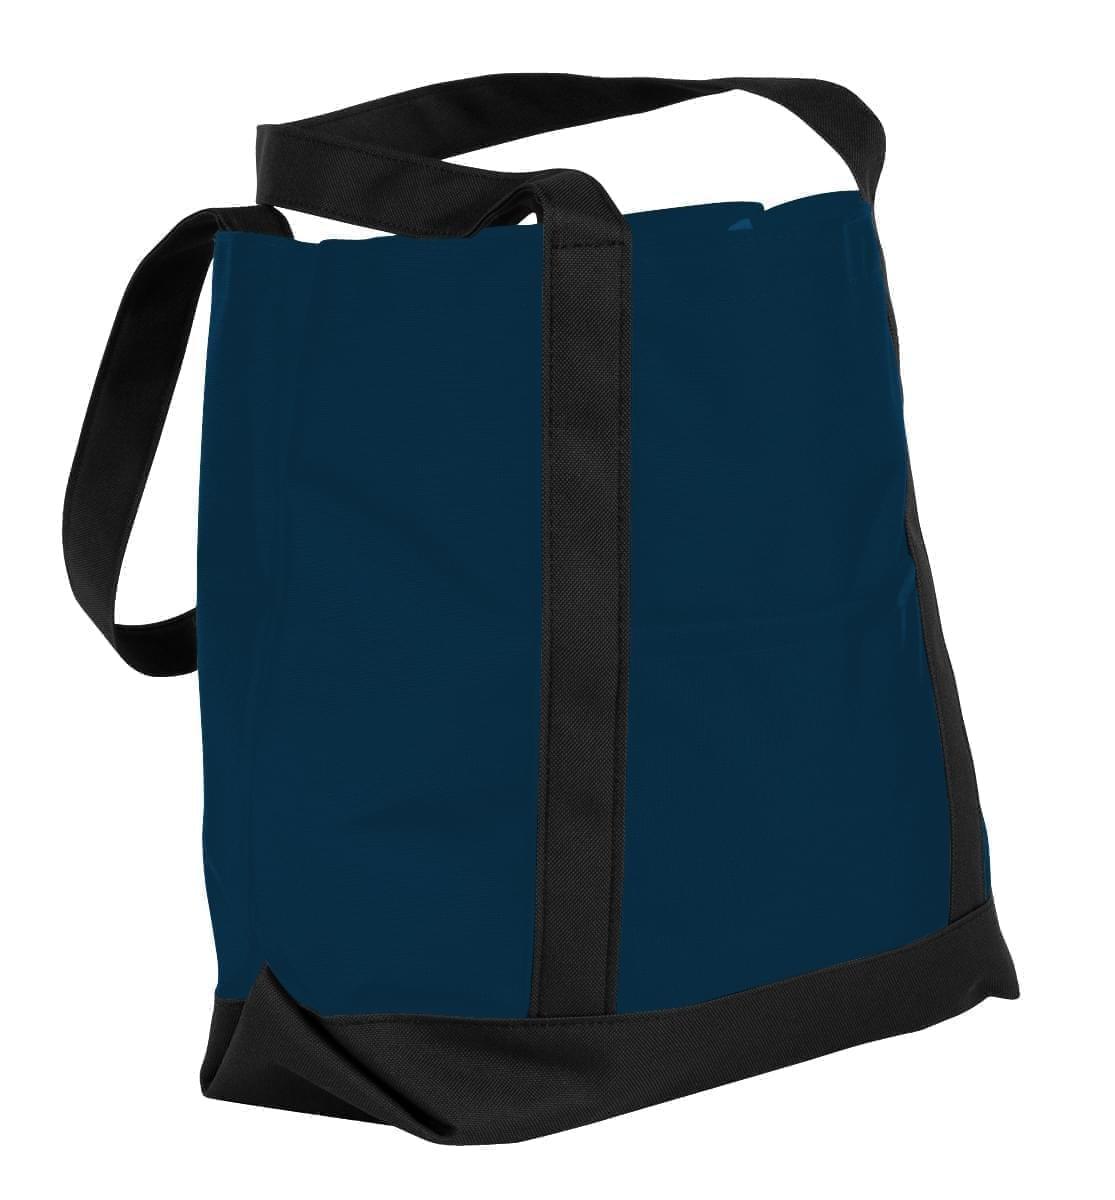 USA Made Canvas Fashion Tote Bags, Navy-Black, XAACL1UACC